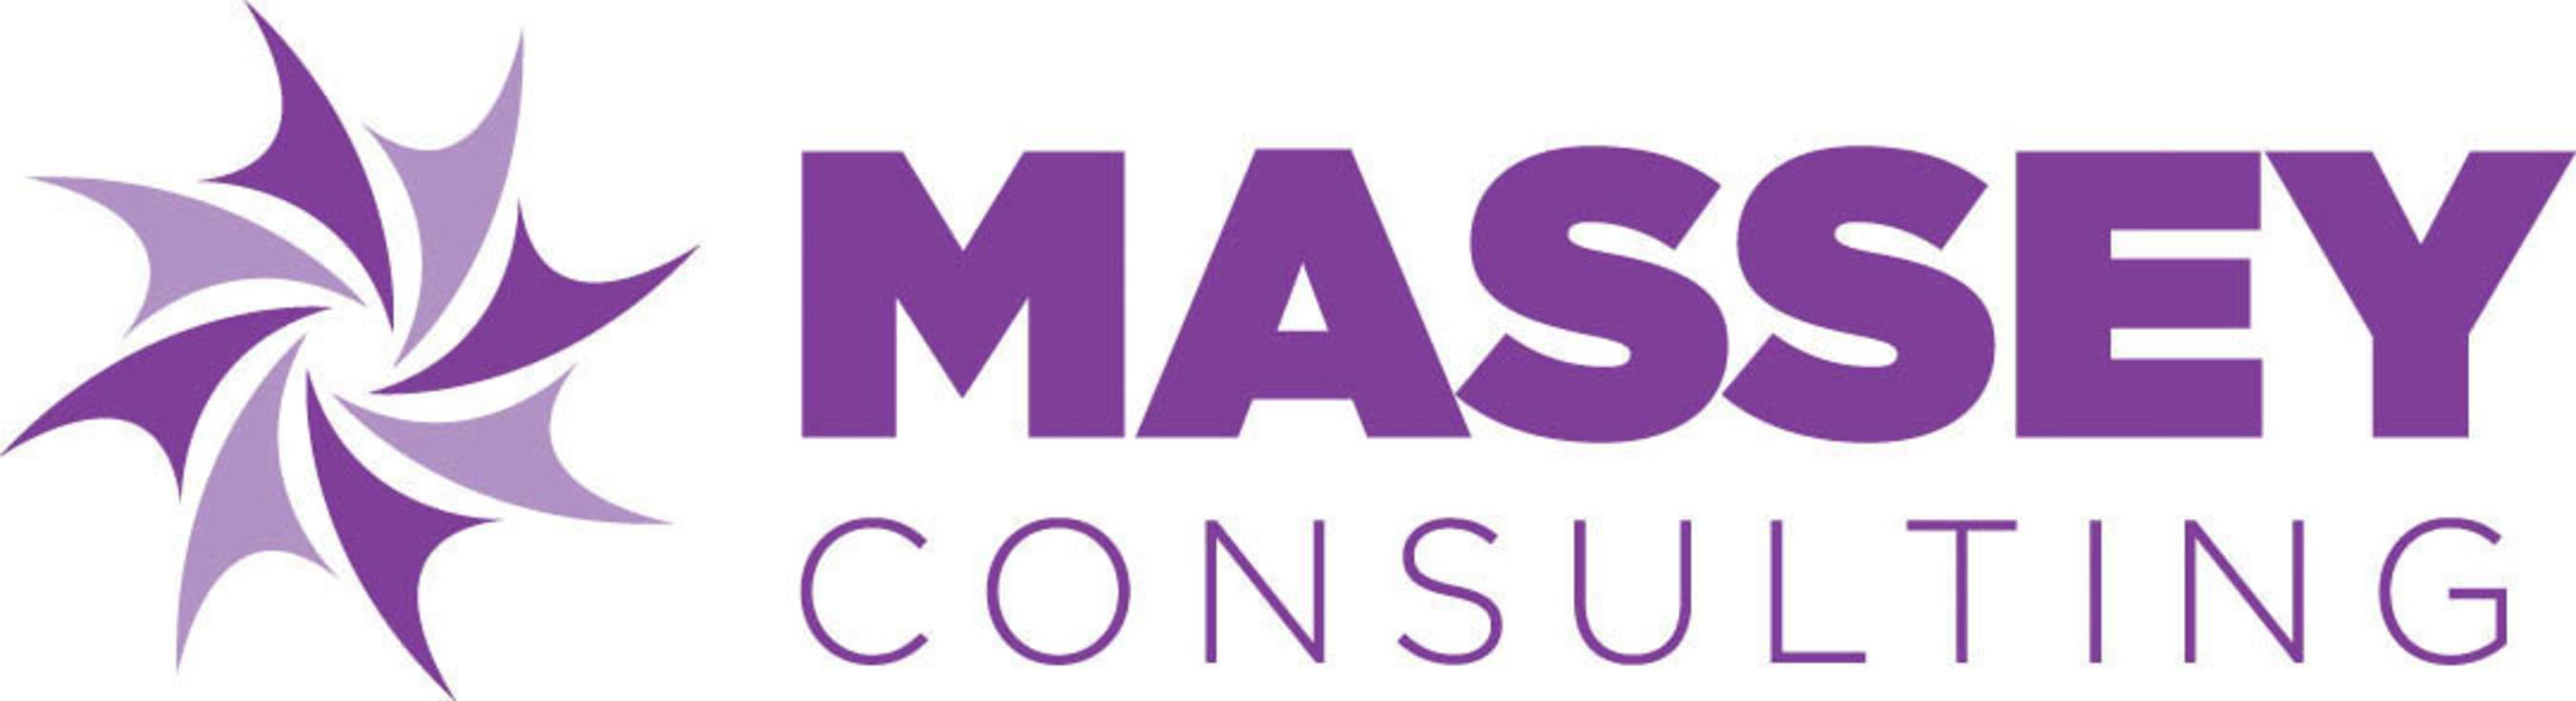 Massey Consulting logo